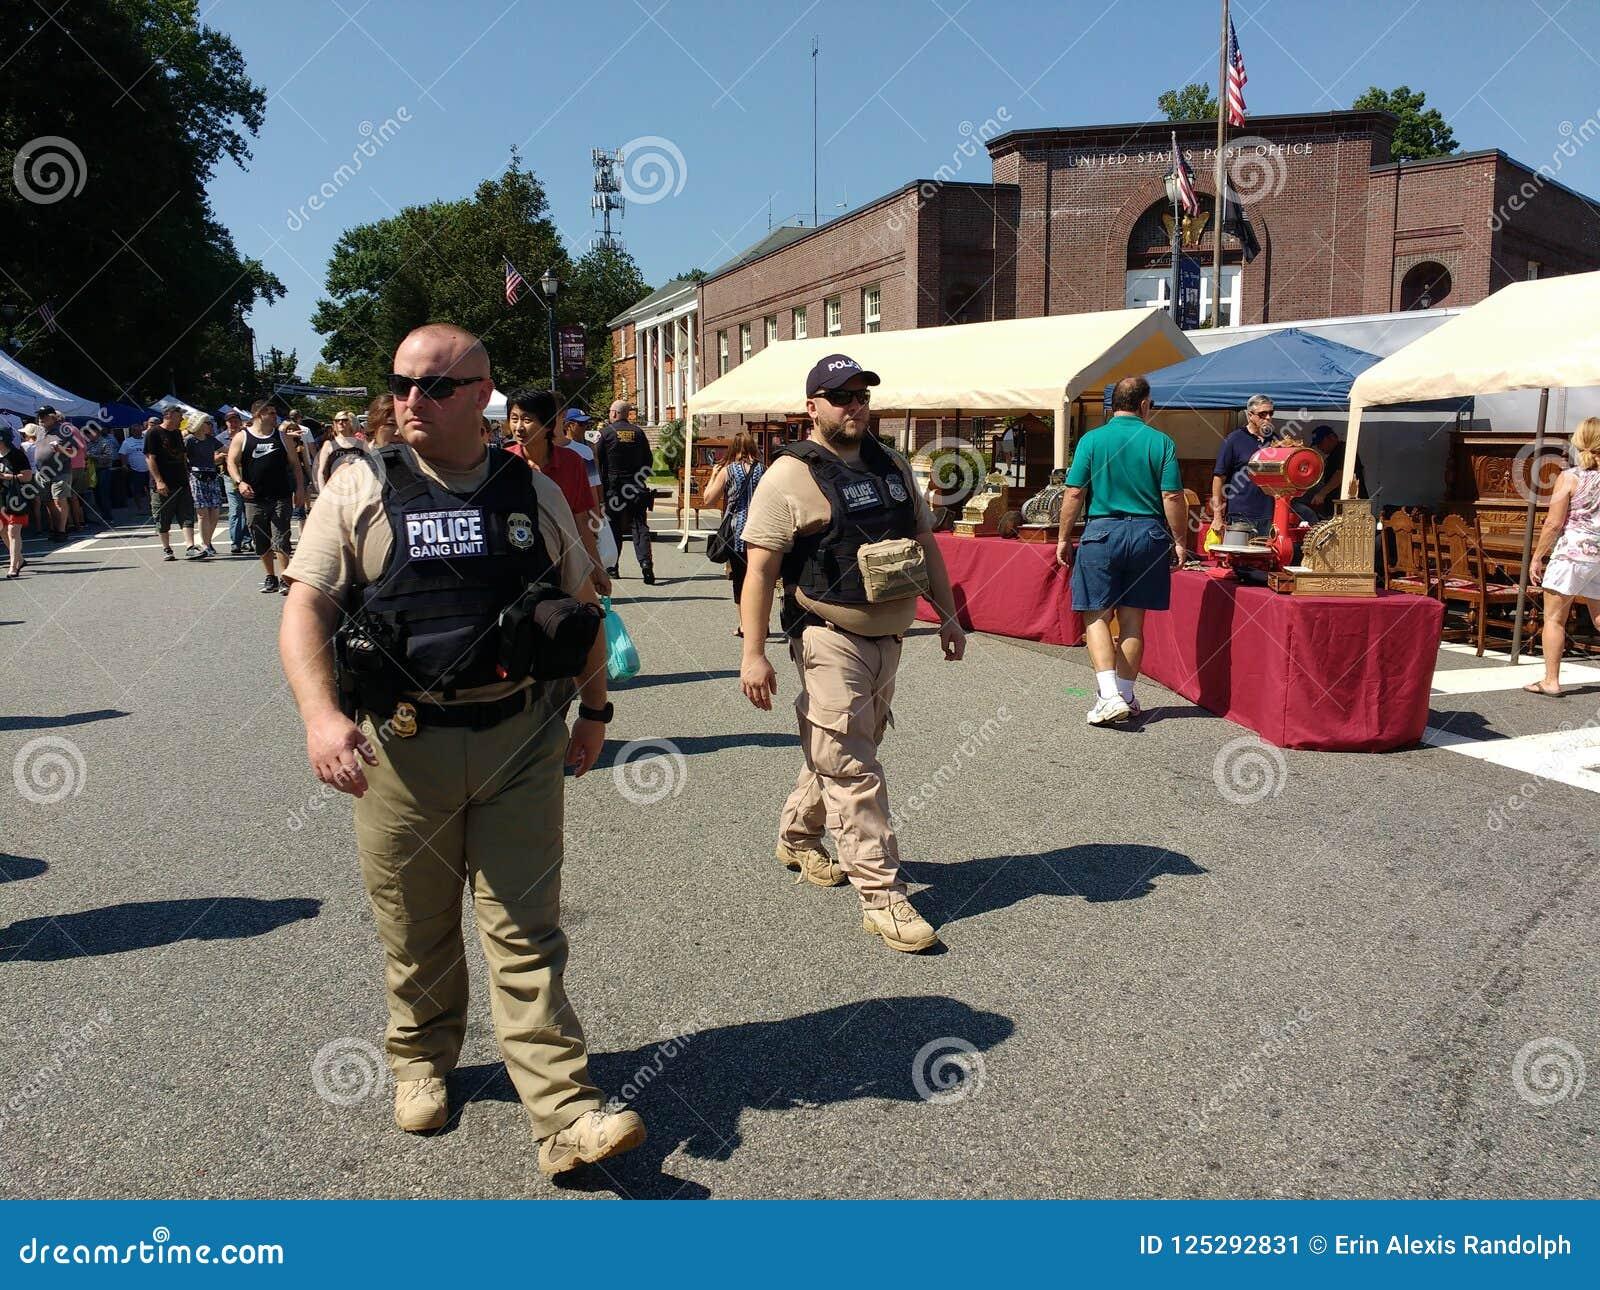 Agentes de la autoridad en la patrulla, Rutherford, NJ, los E.E.U.U.